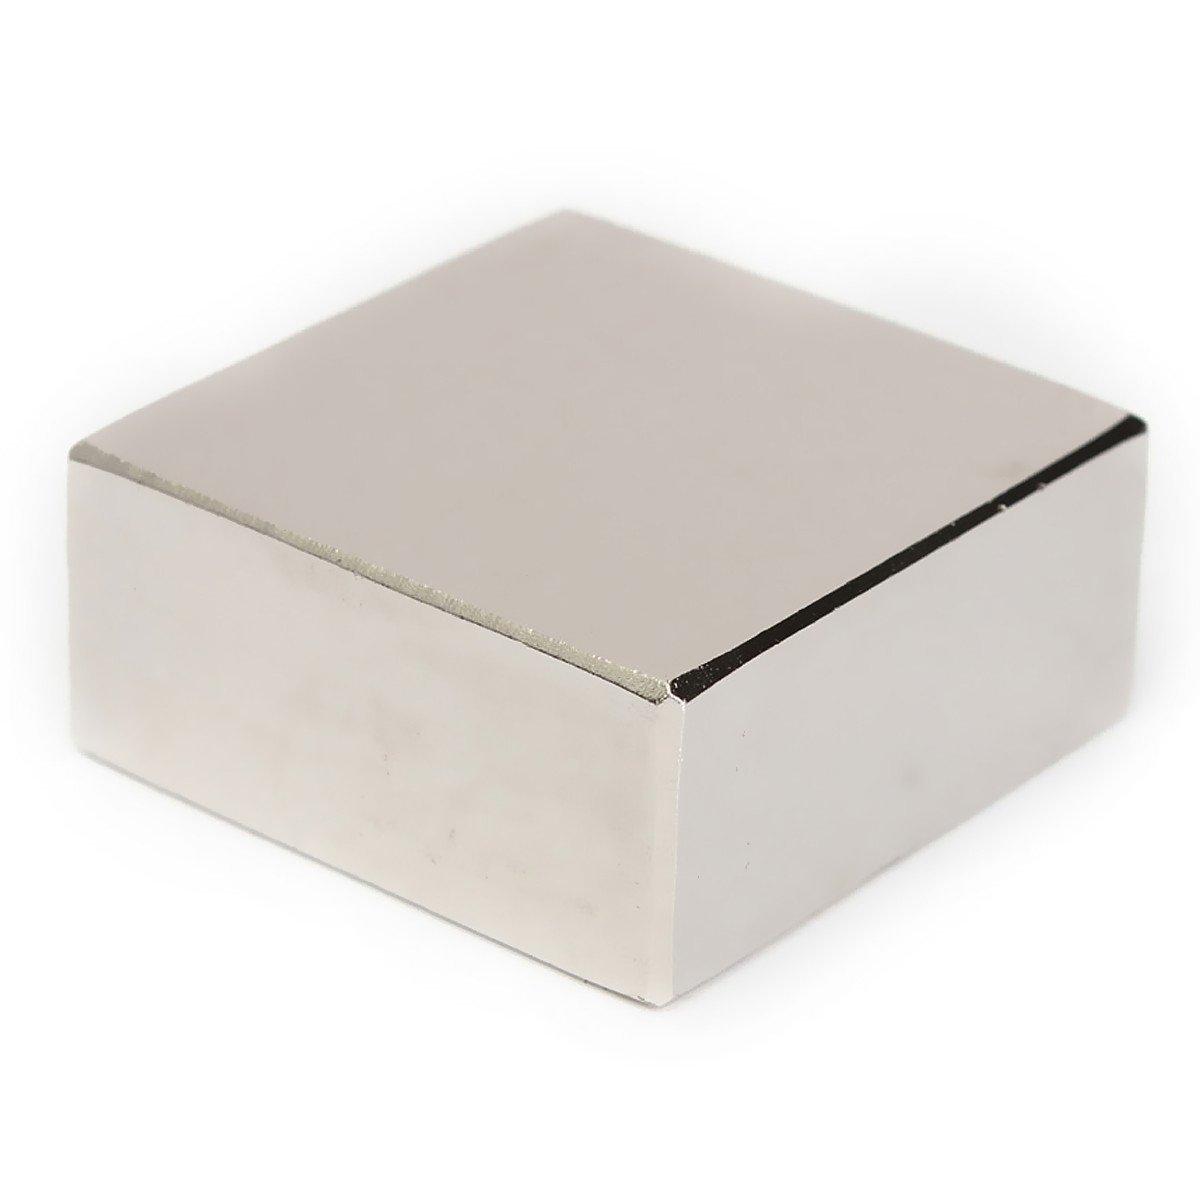 AOMAG Block 40x40x20mm N52 Super Strong Rare Earth magnets Neodymium Magnet 1.57''x1.57''x 4/5''(+/-0.05mm)